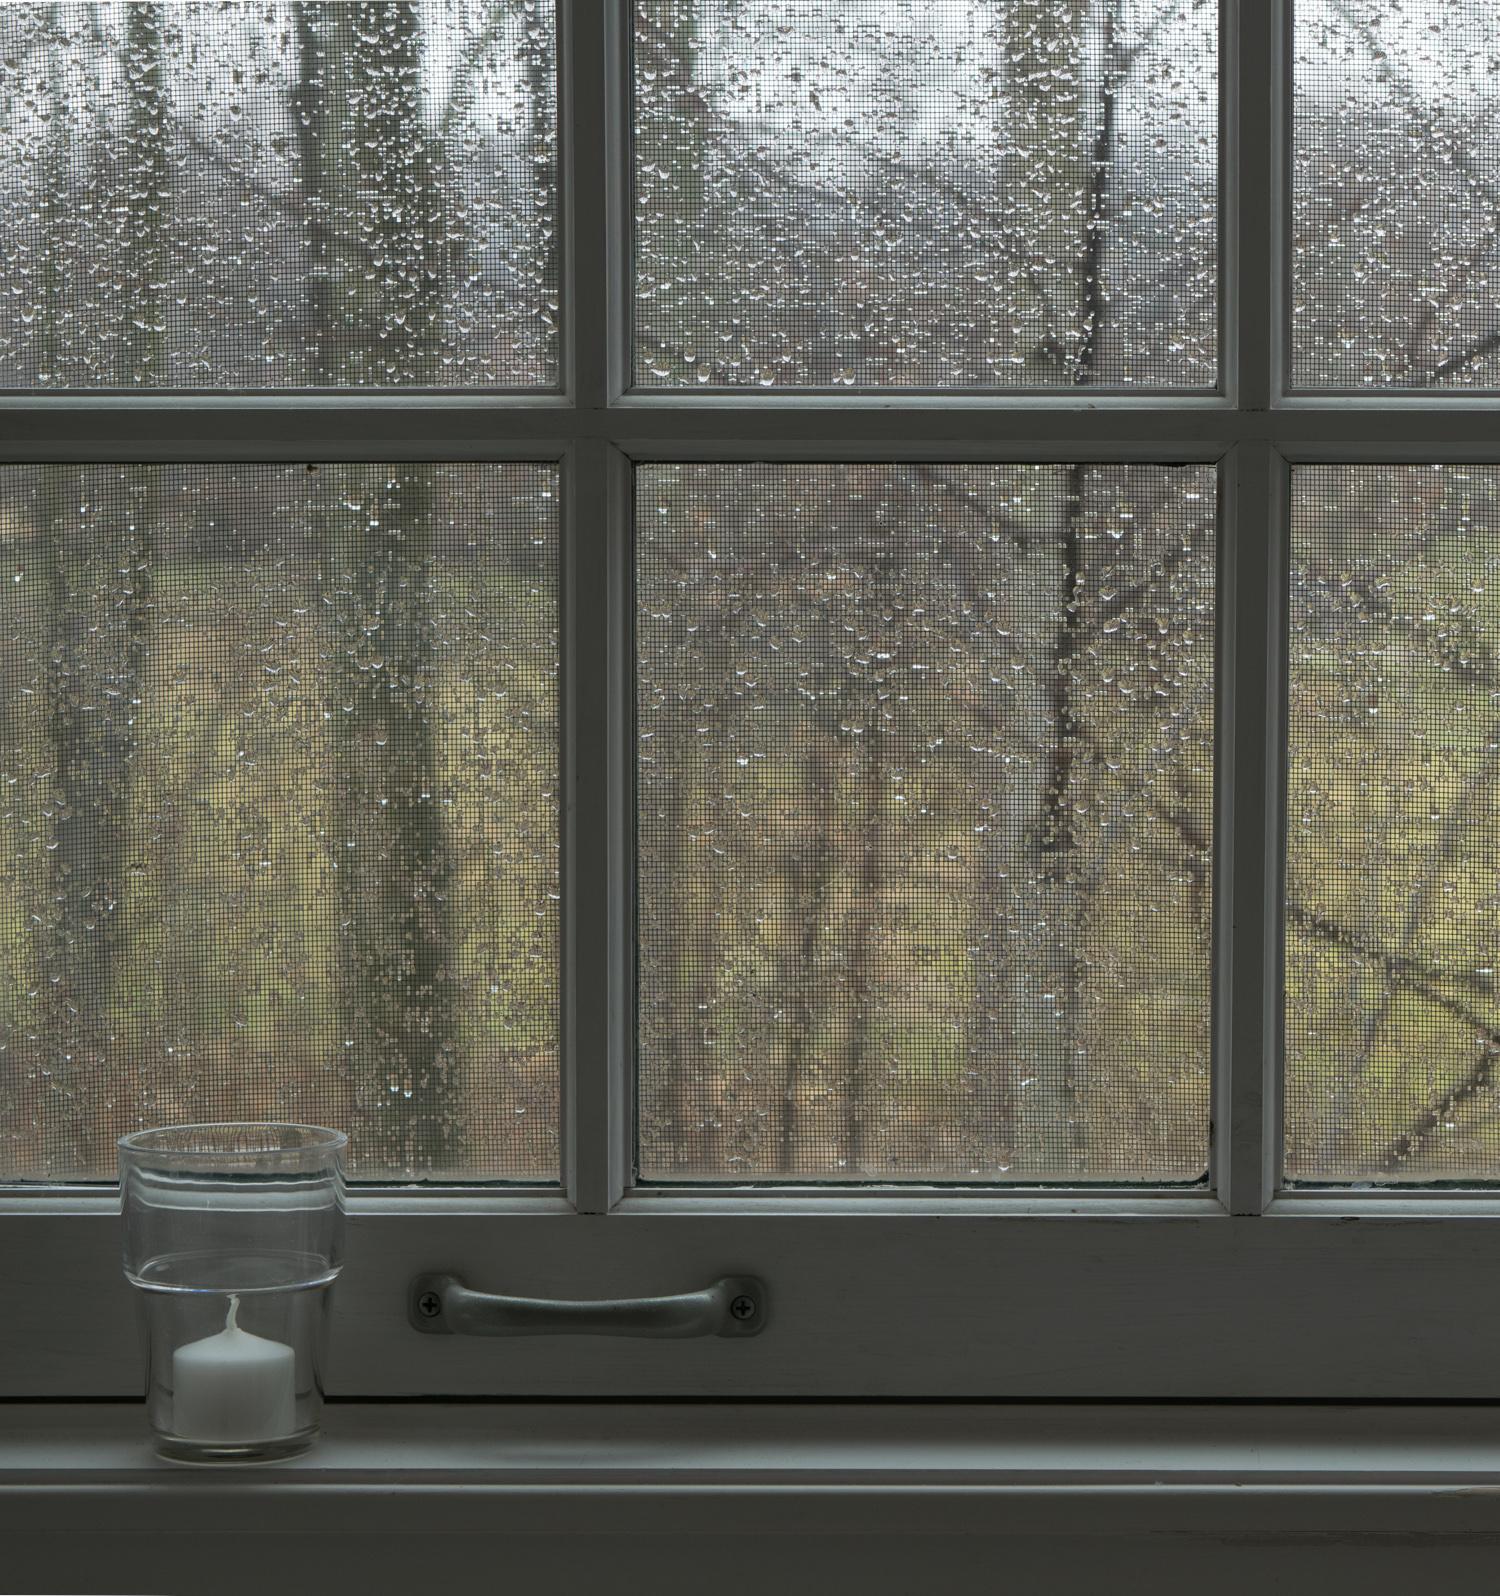 late february raining.jpg